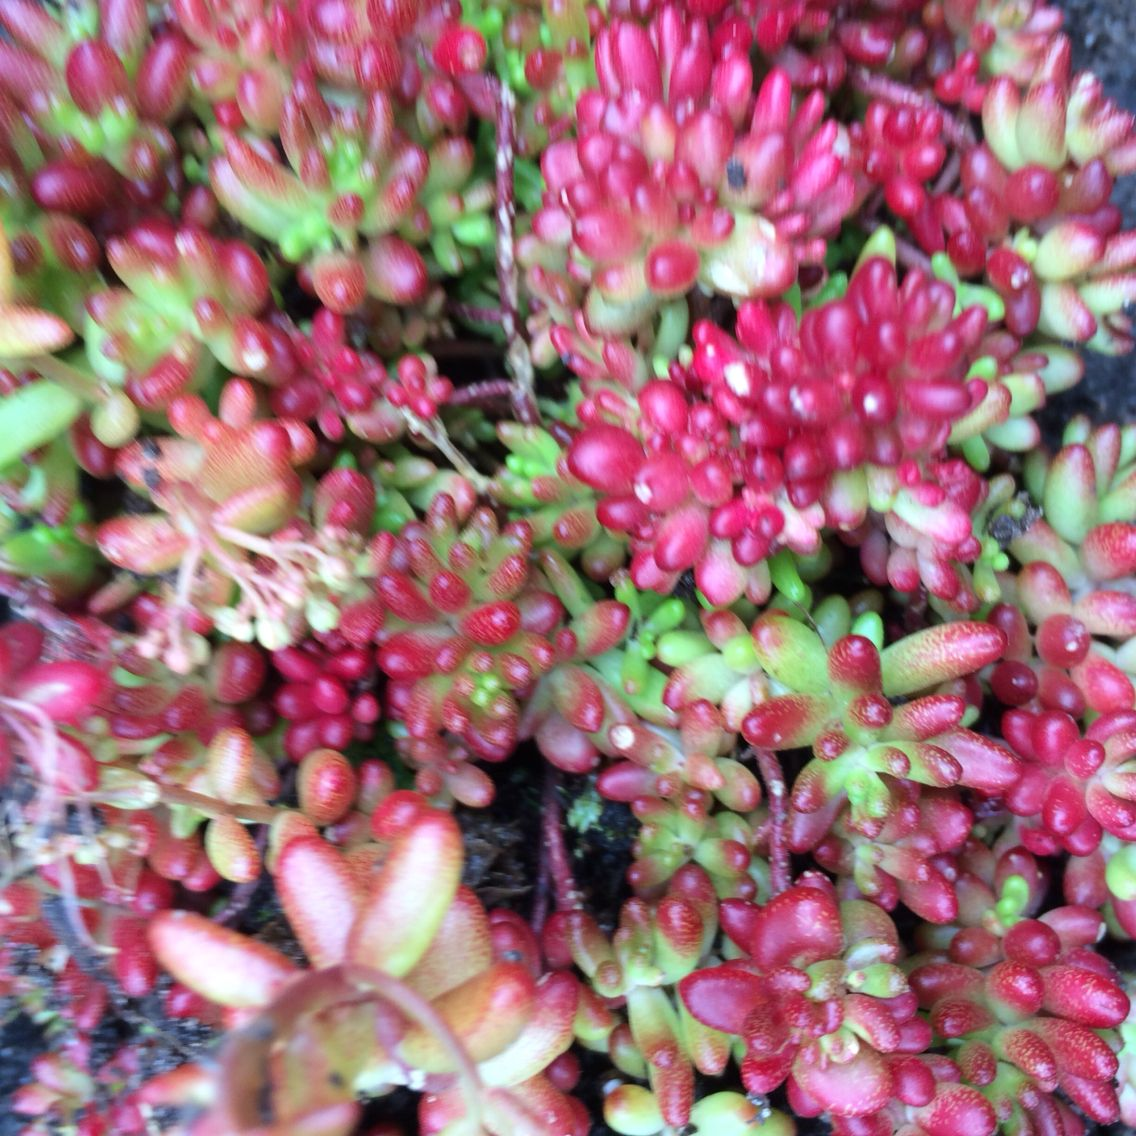 Sedum album 39 coral carpet 39 planta juni 2015 i steintrappa a a 39 one off 39 treasures hoyas - Sedum album coral carpet ...